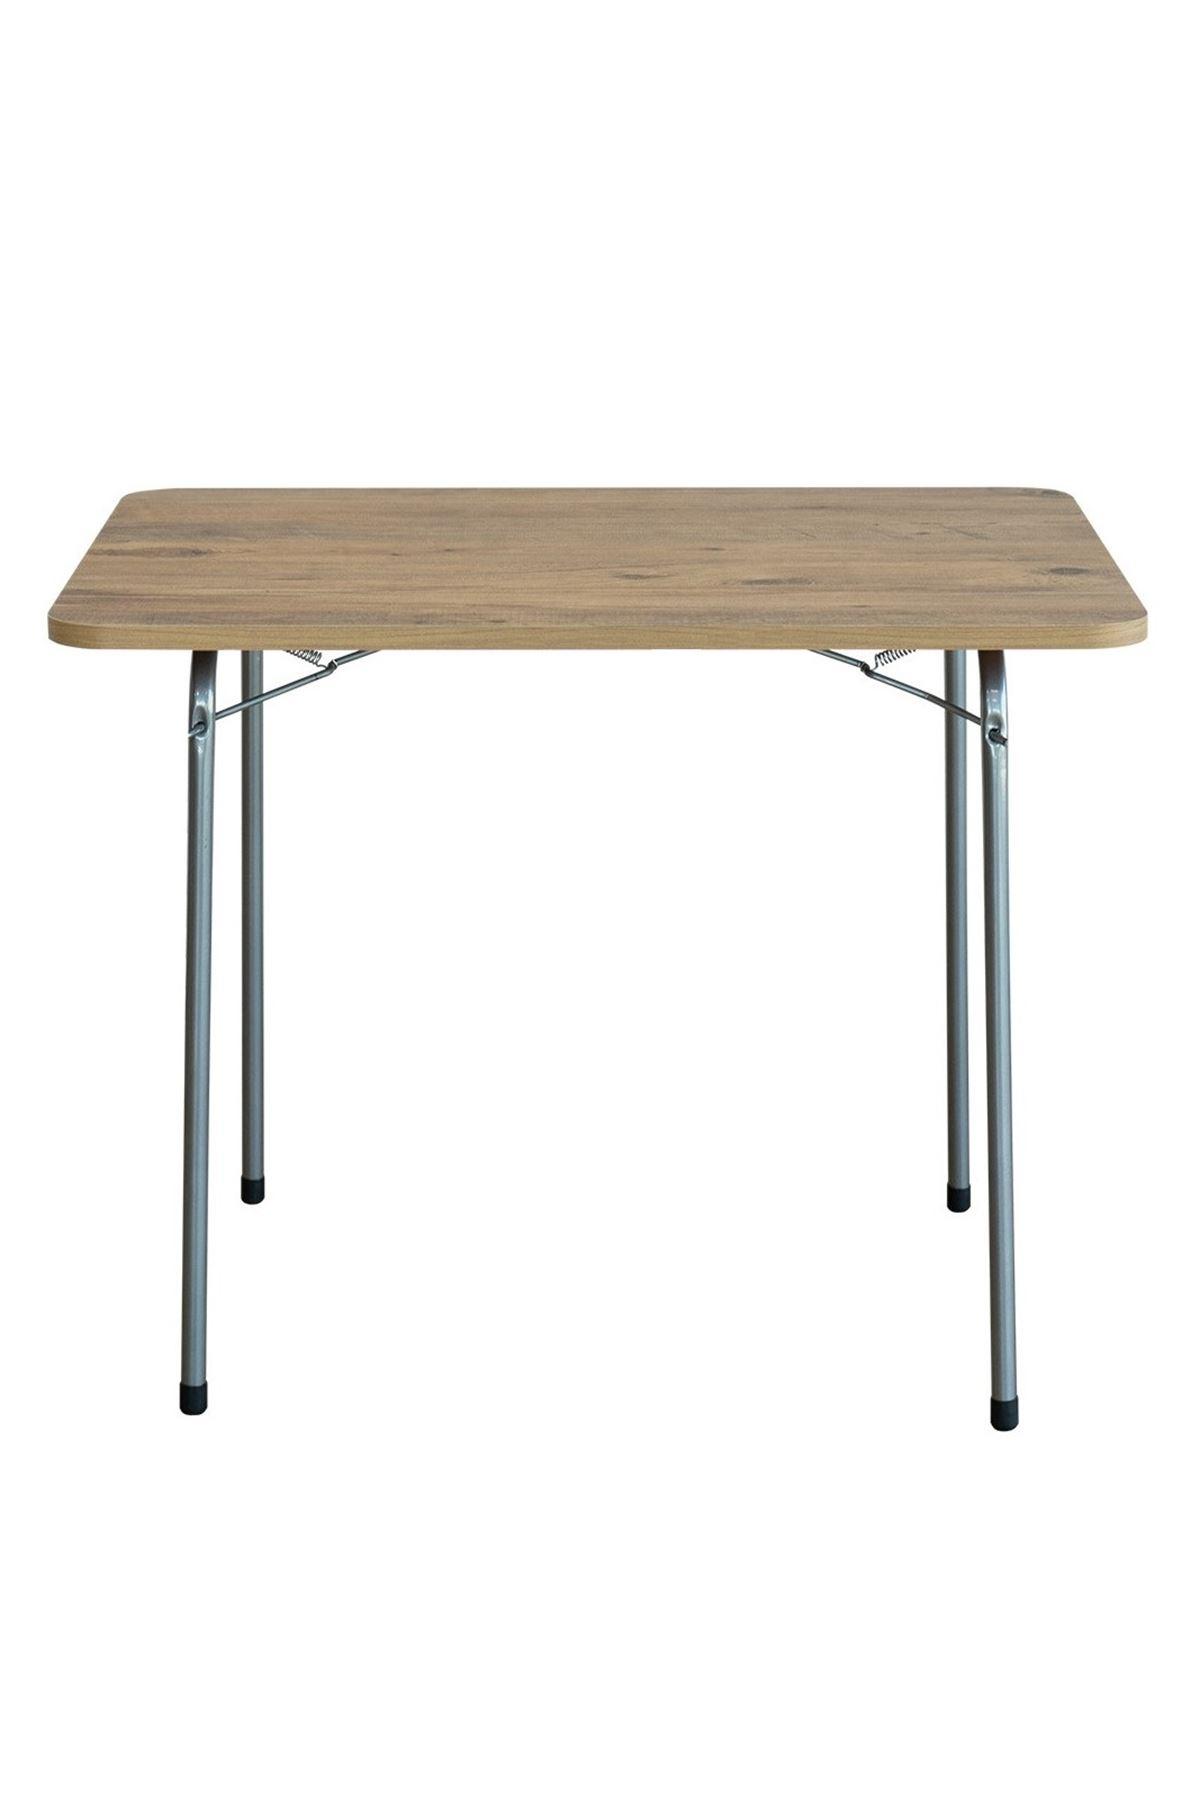 Bofigo 60X80 Pine Patterned Folding Table + 4 Pieces Folding Chair Camping Set Garden Set Navy Blue